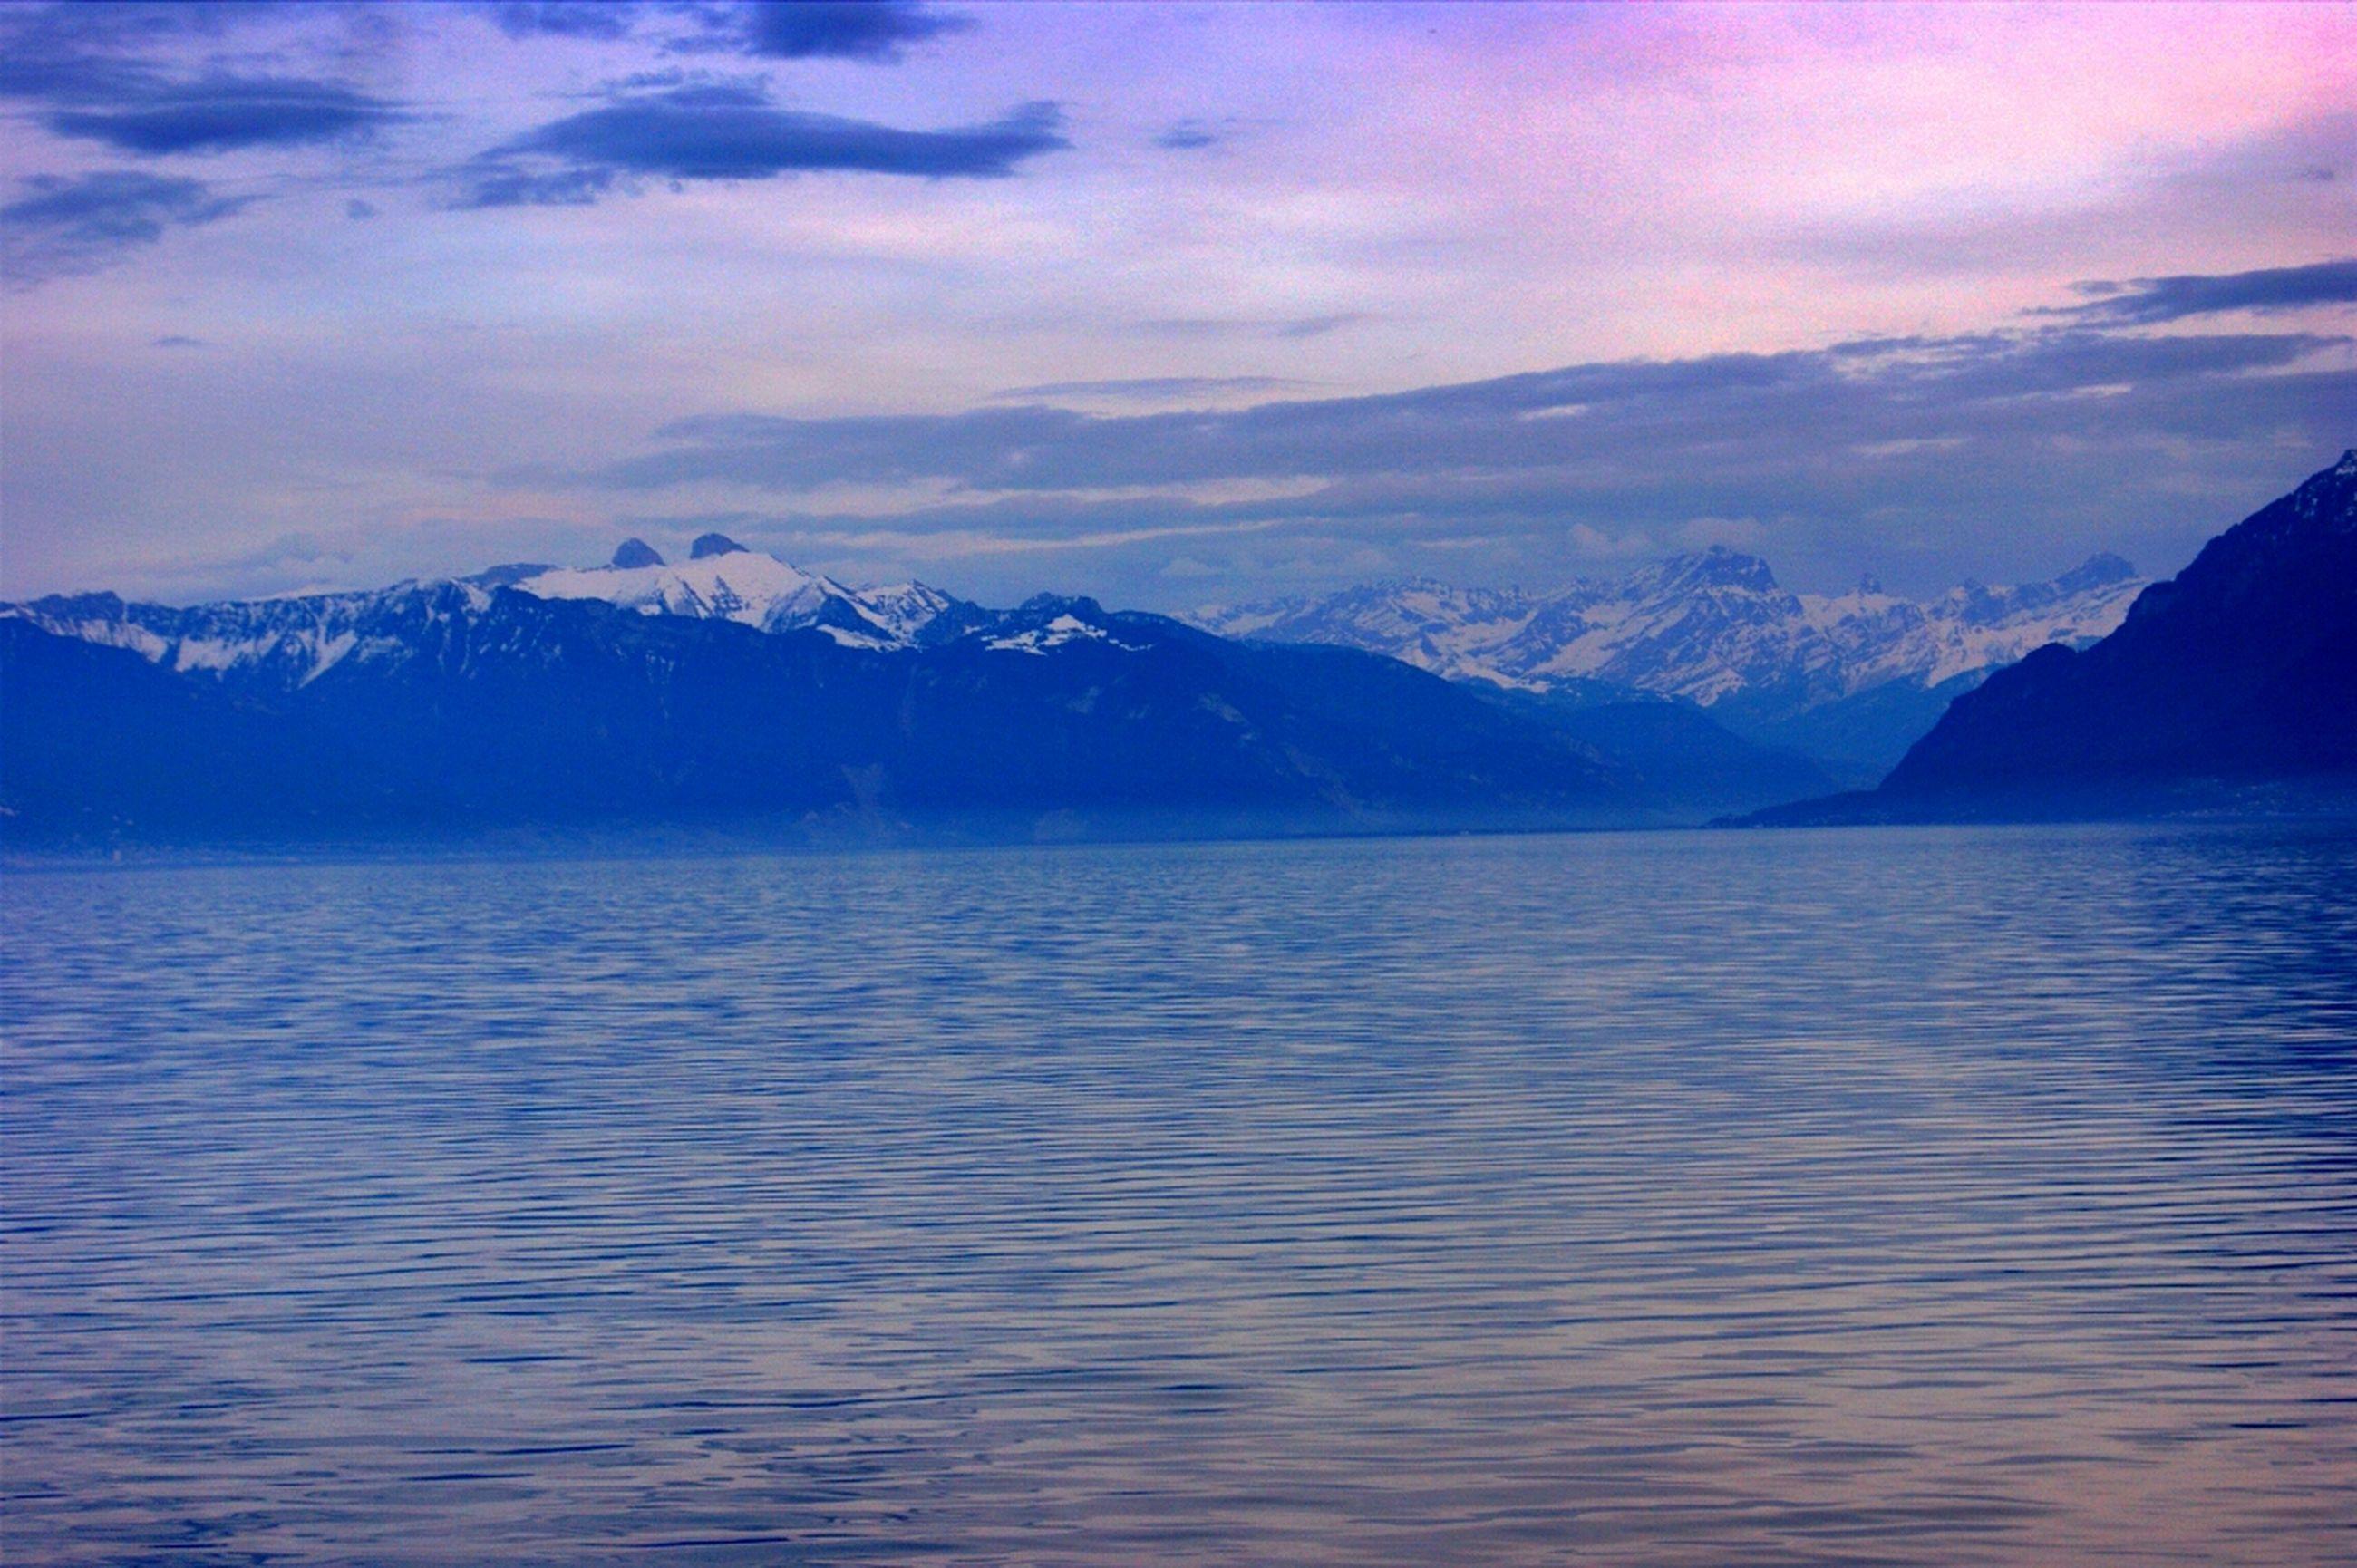 mountain, tranquil scene, scenics, mountain range, tranquility, water, beauty in nature, waterfront, sky, lake, nature, cloud - sky, idyllic, rippled, winter, cold temperature, cloud, snow, snowcapped mountain, non-urban scene